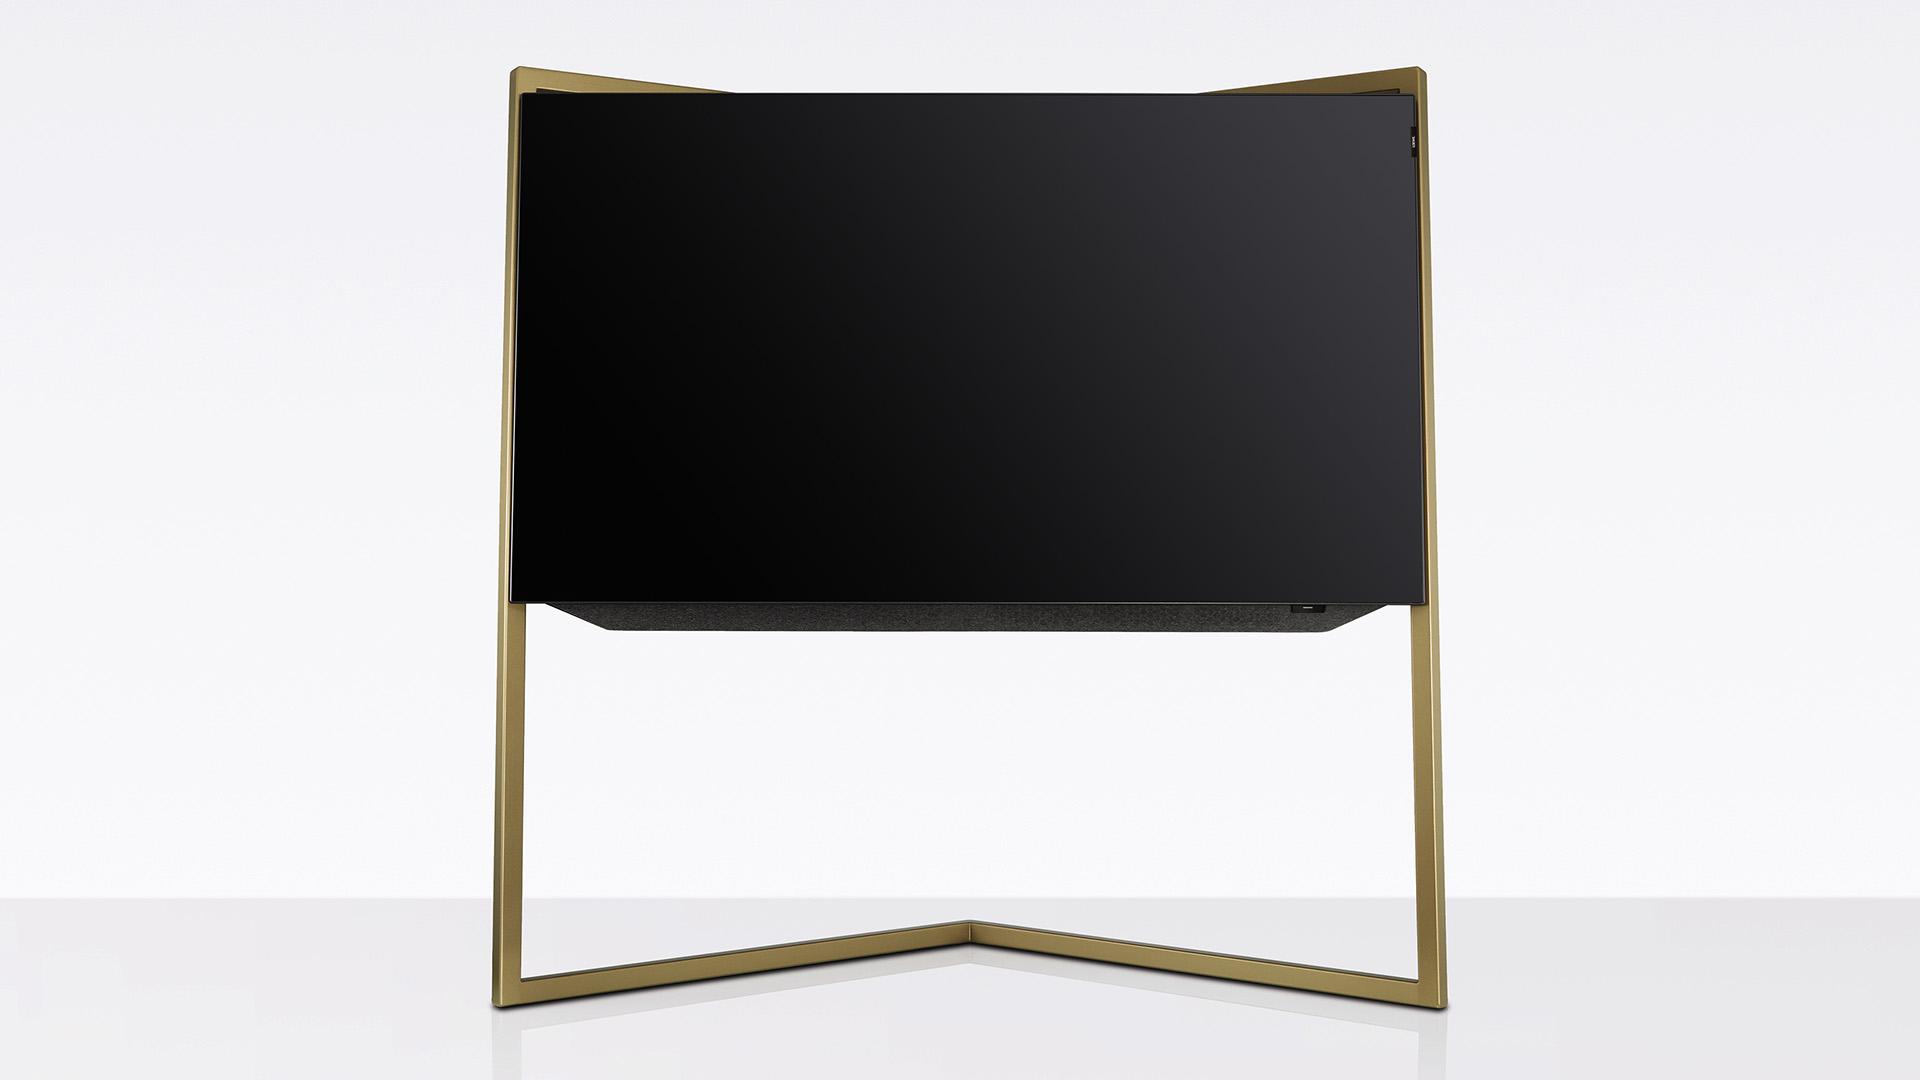 loewe bild oled scala hifi scala hifi. Black Bedroom Furniture Sets. Home Design Ideas